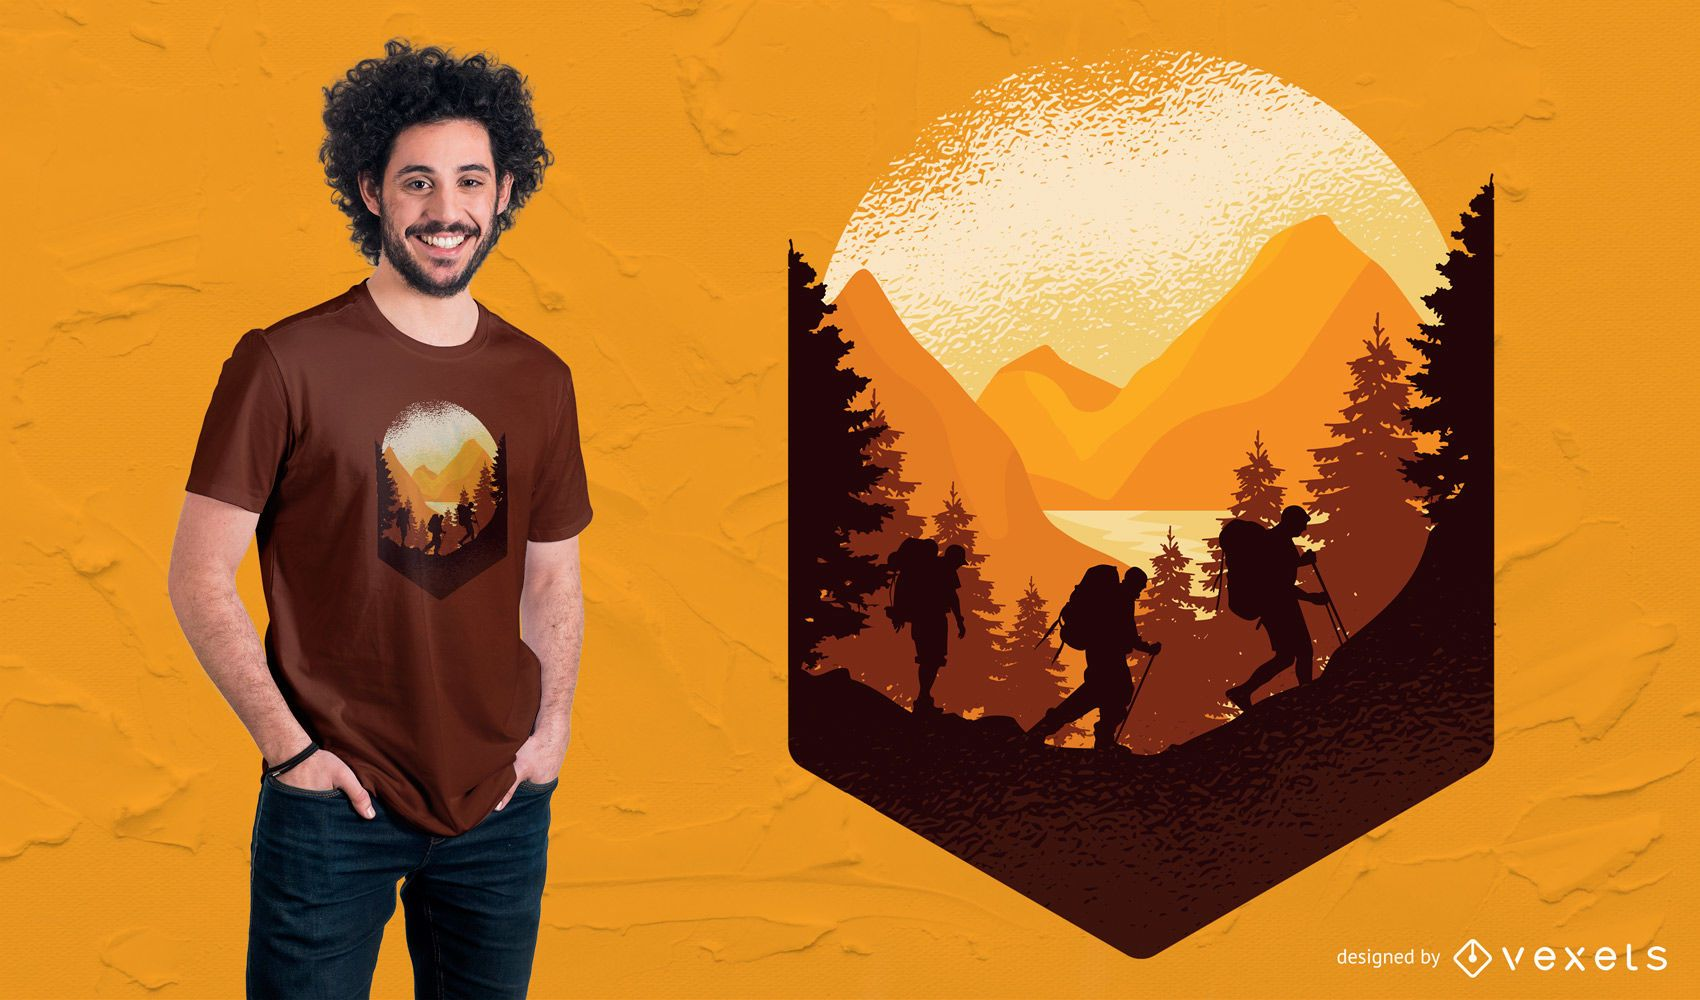 Hiking Outdoors T-Shirt Design